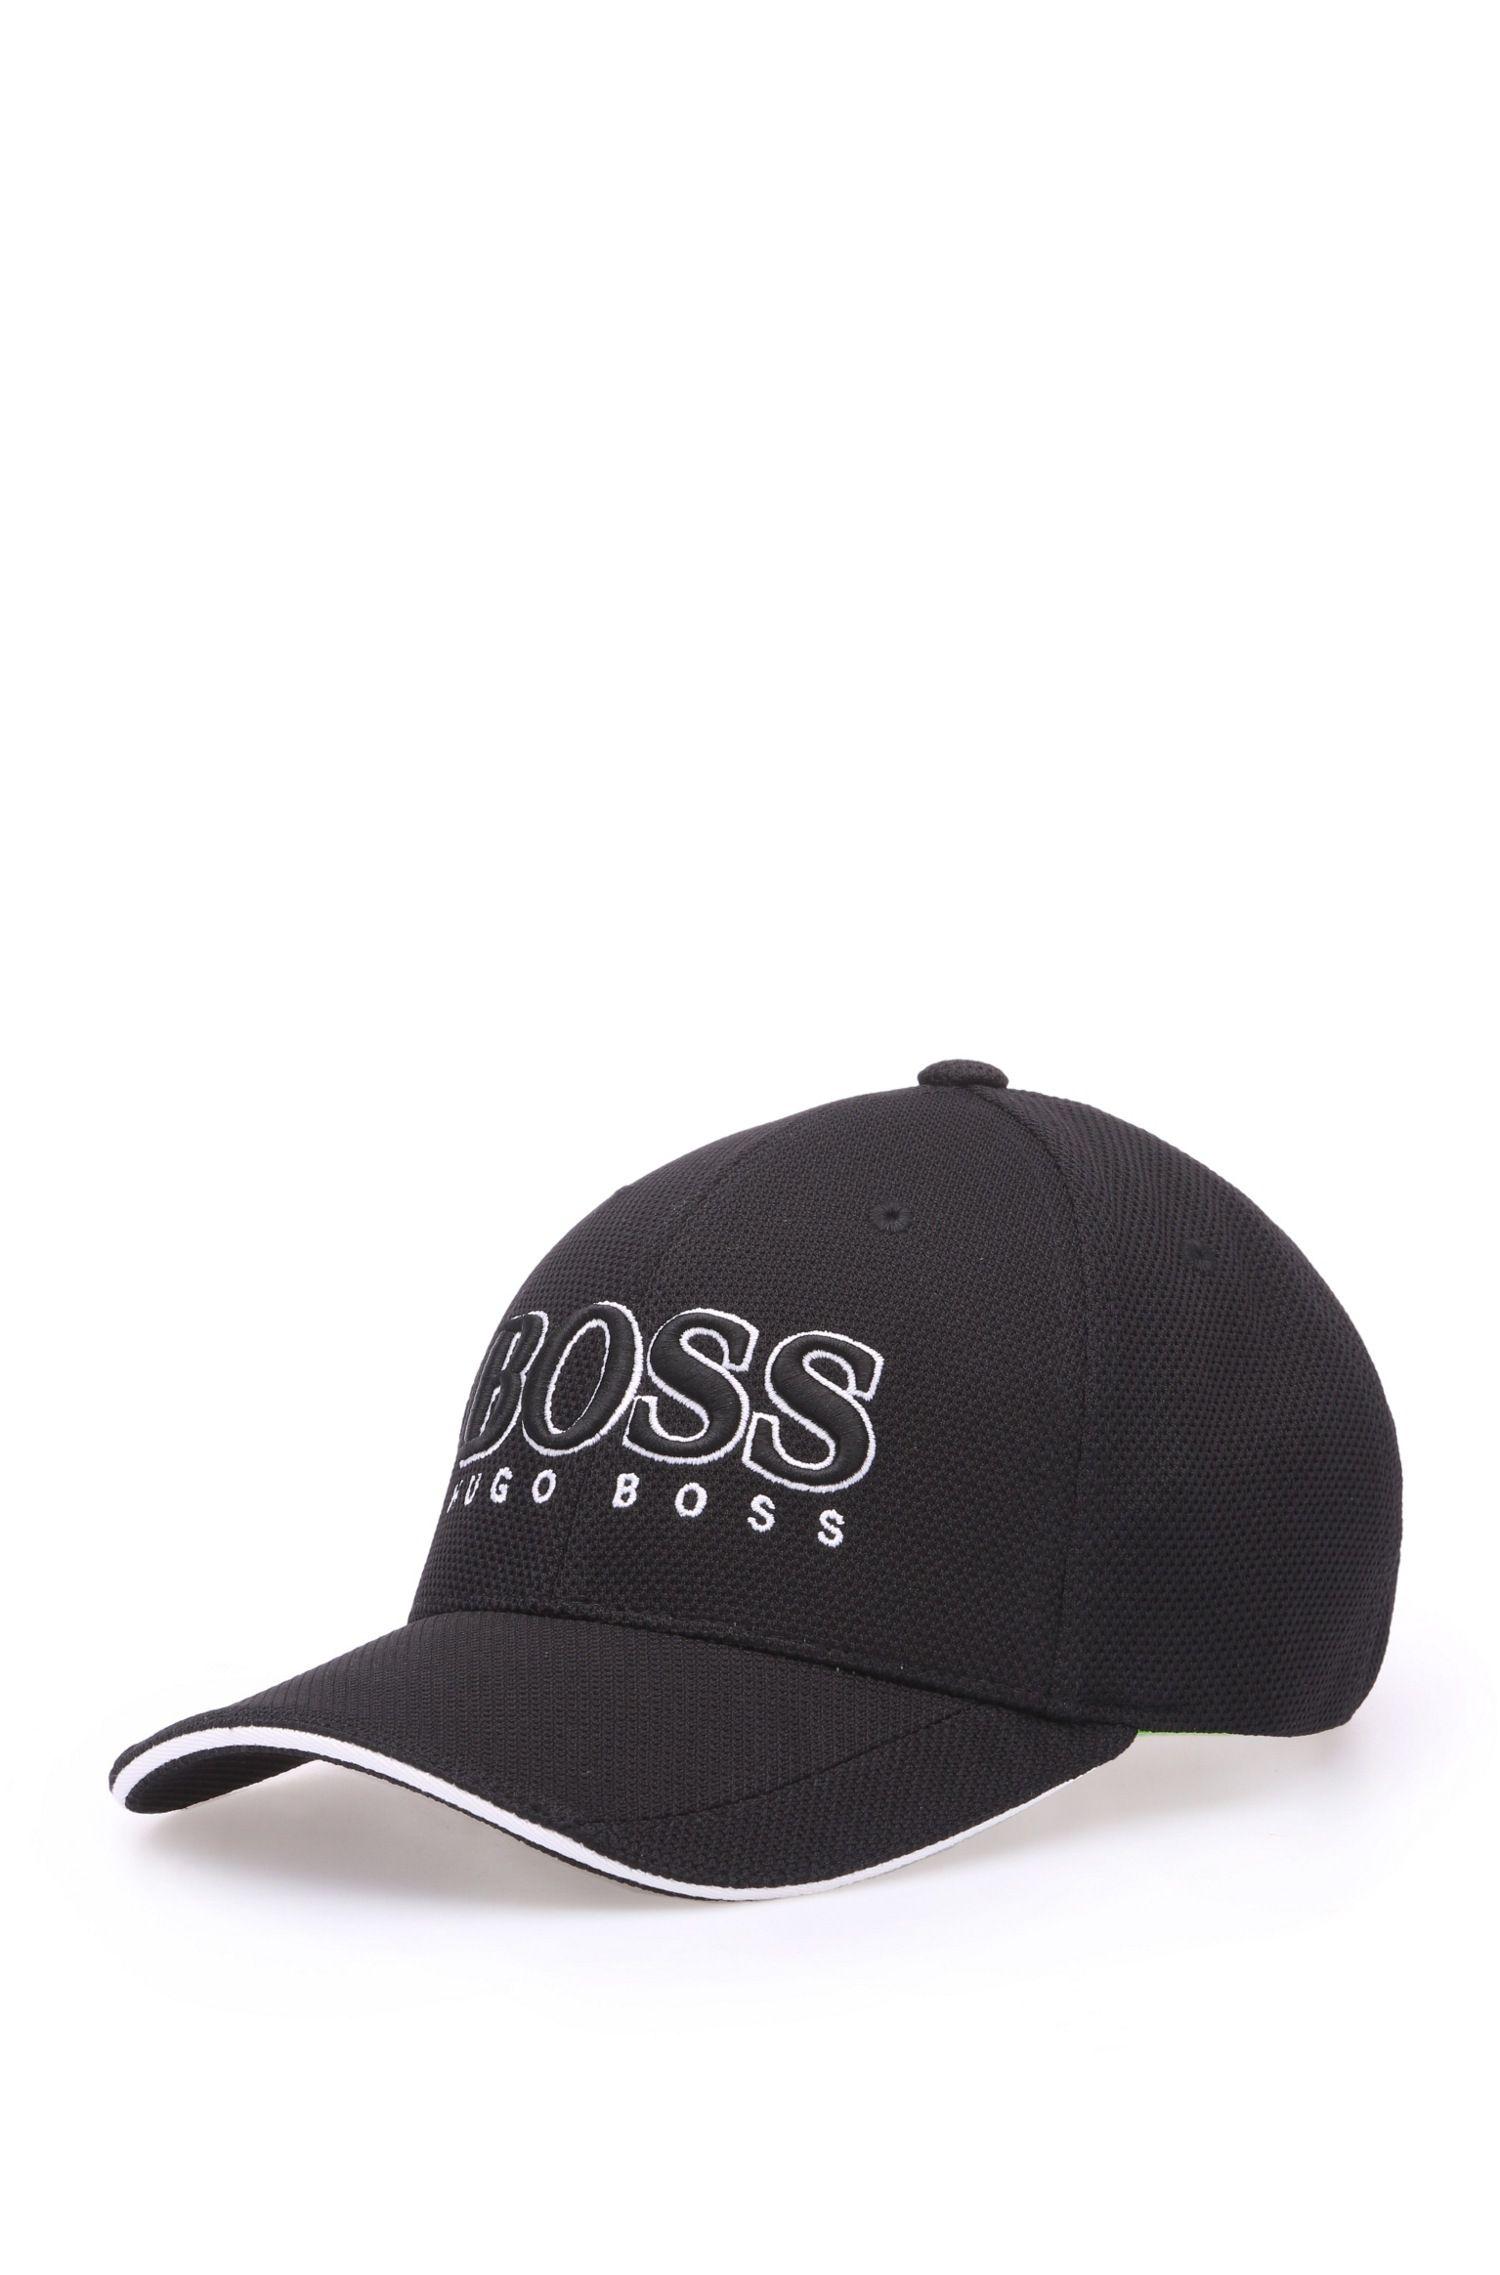 3-D Logo Performance Hat   Cap US